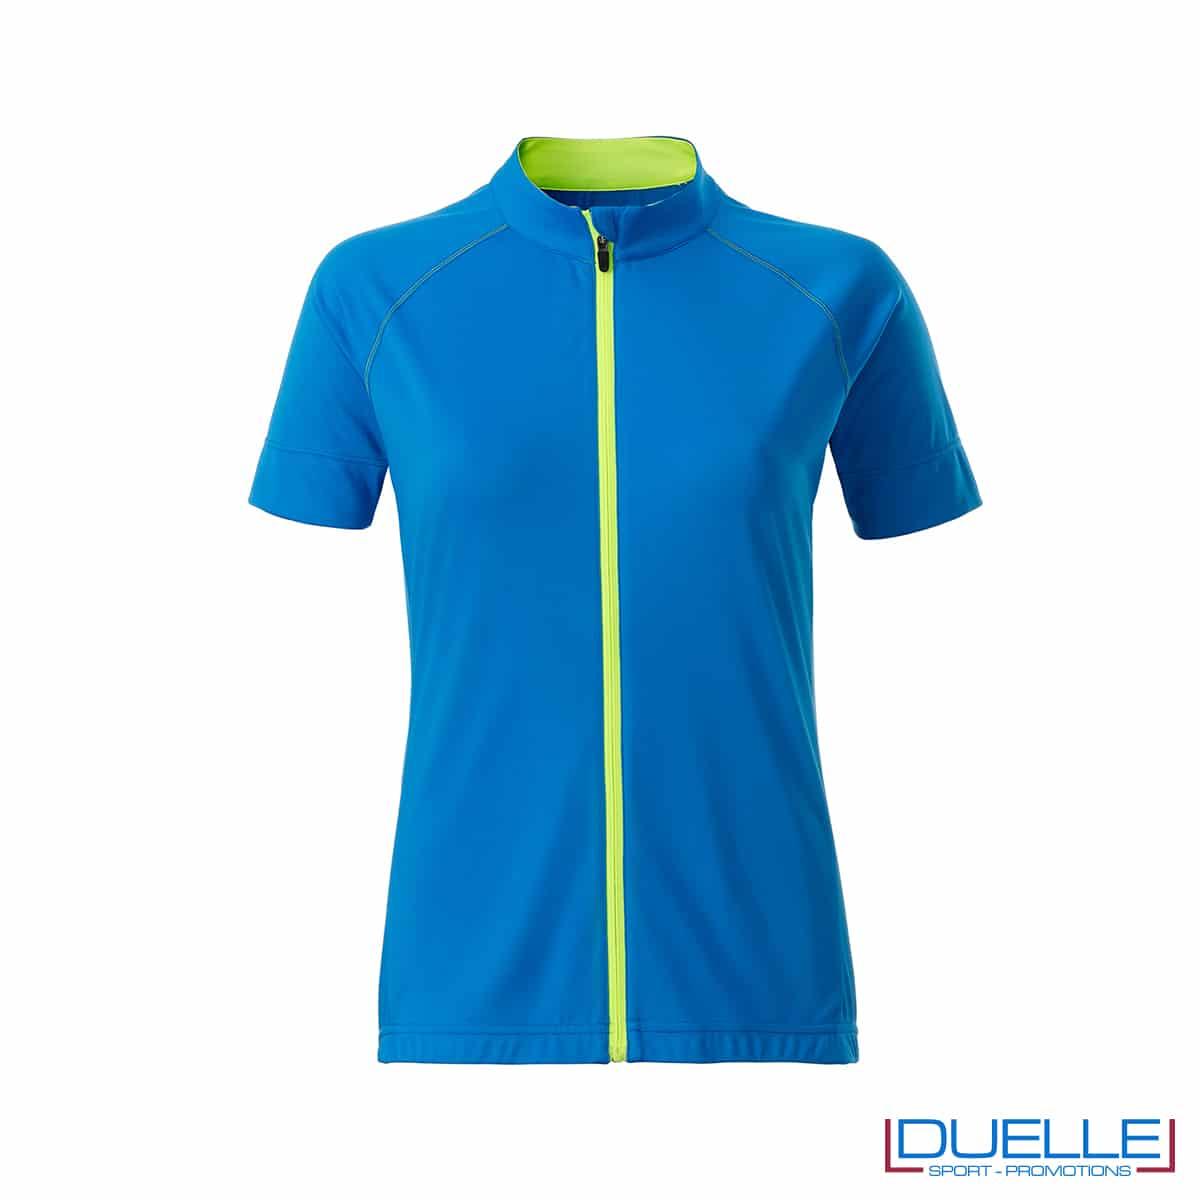 polo azzurra full zip ciclismo femminile